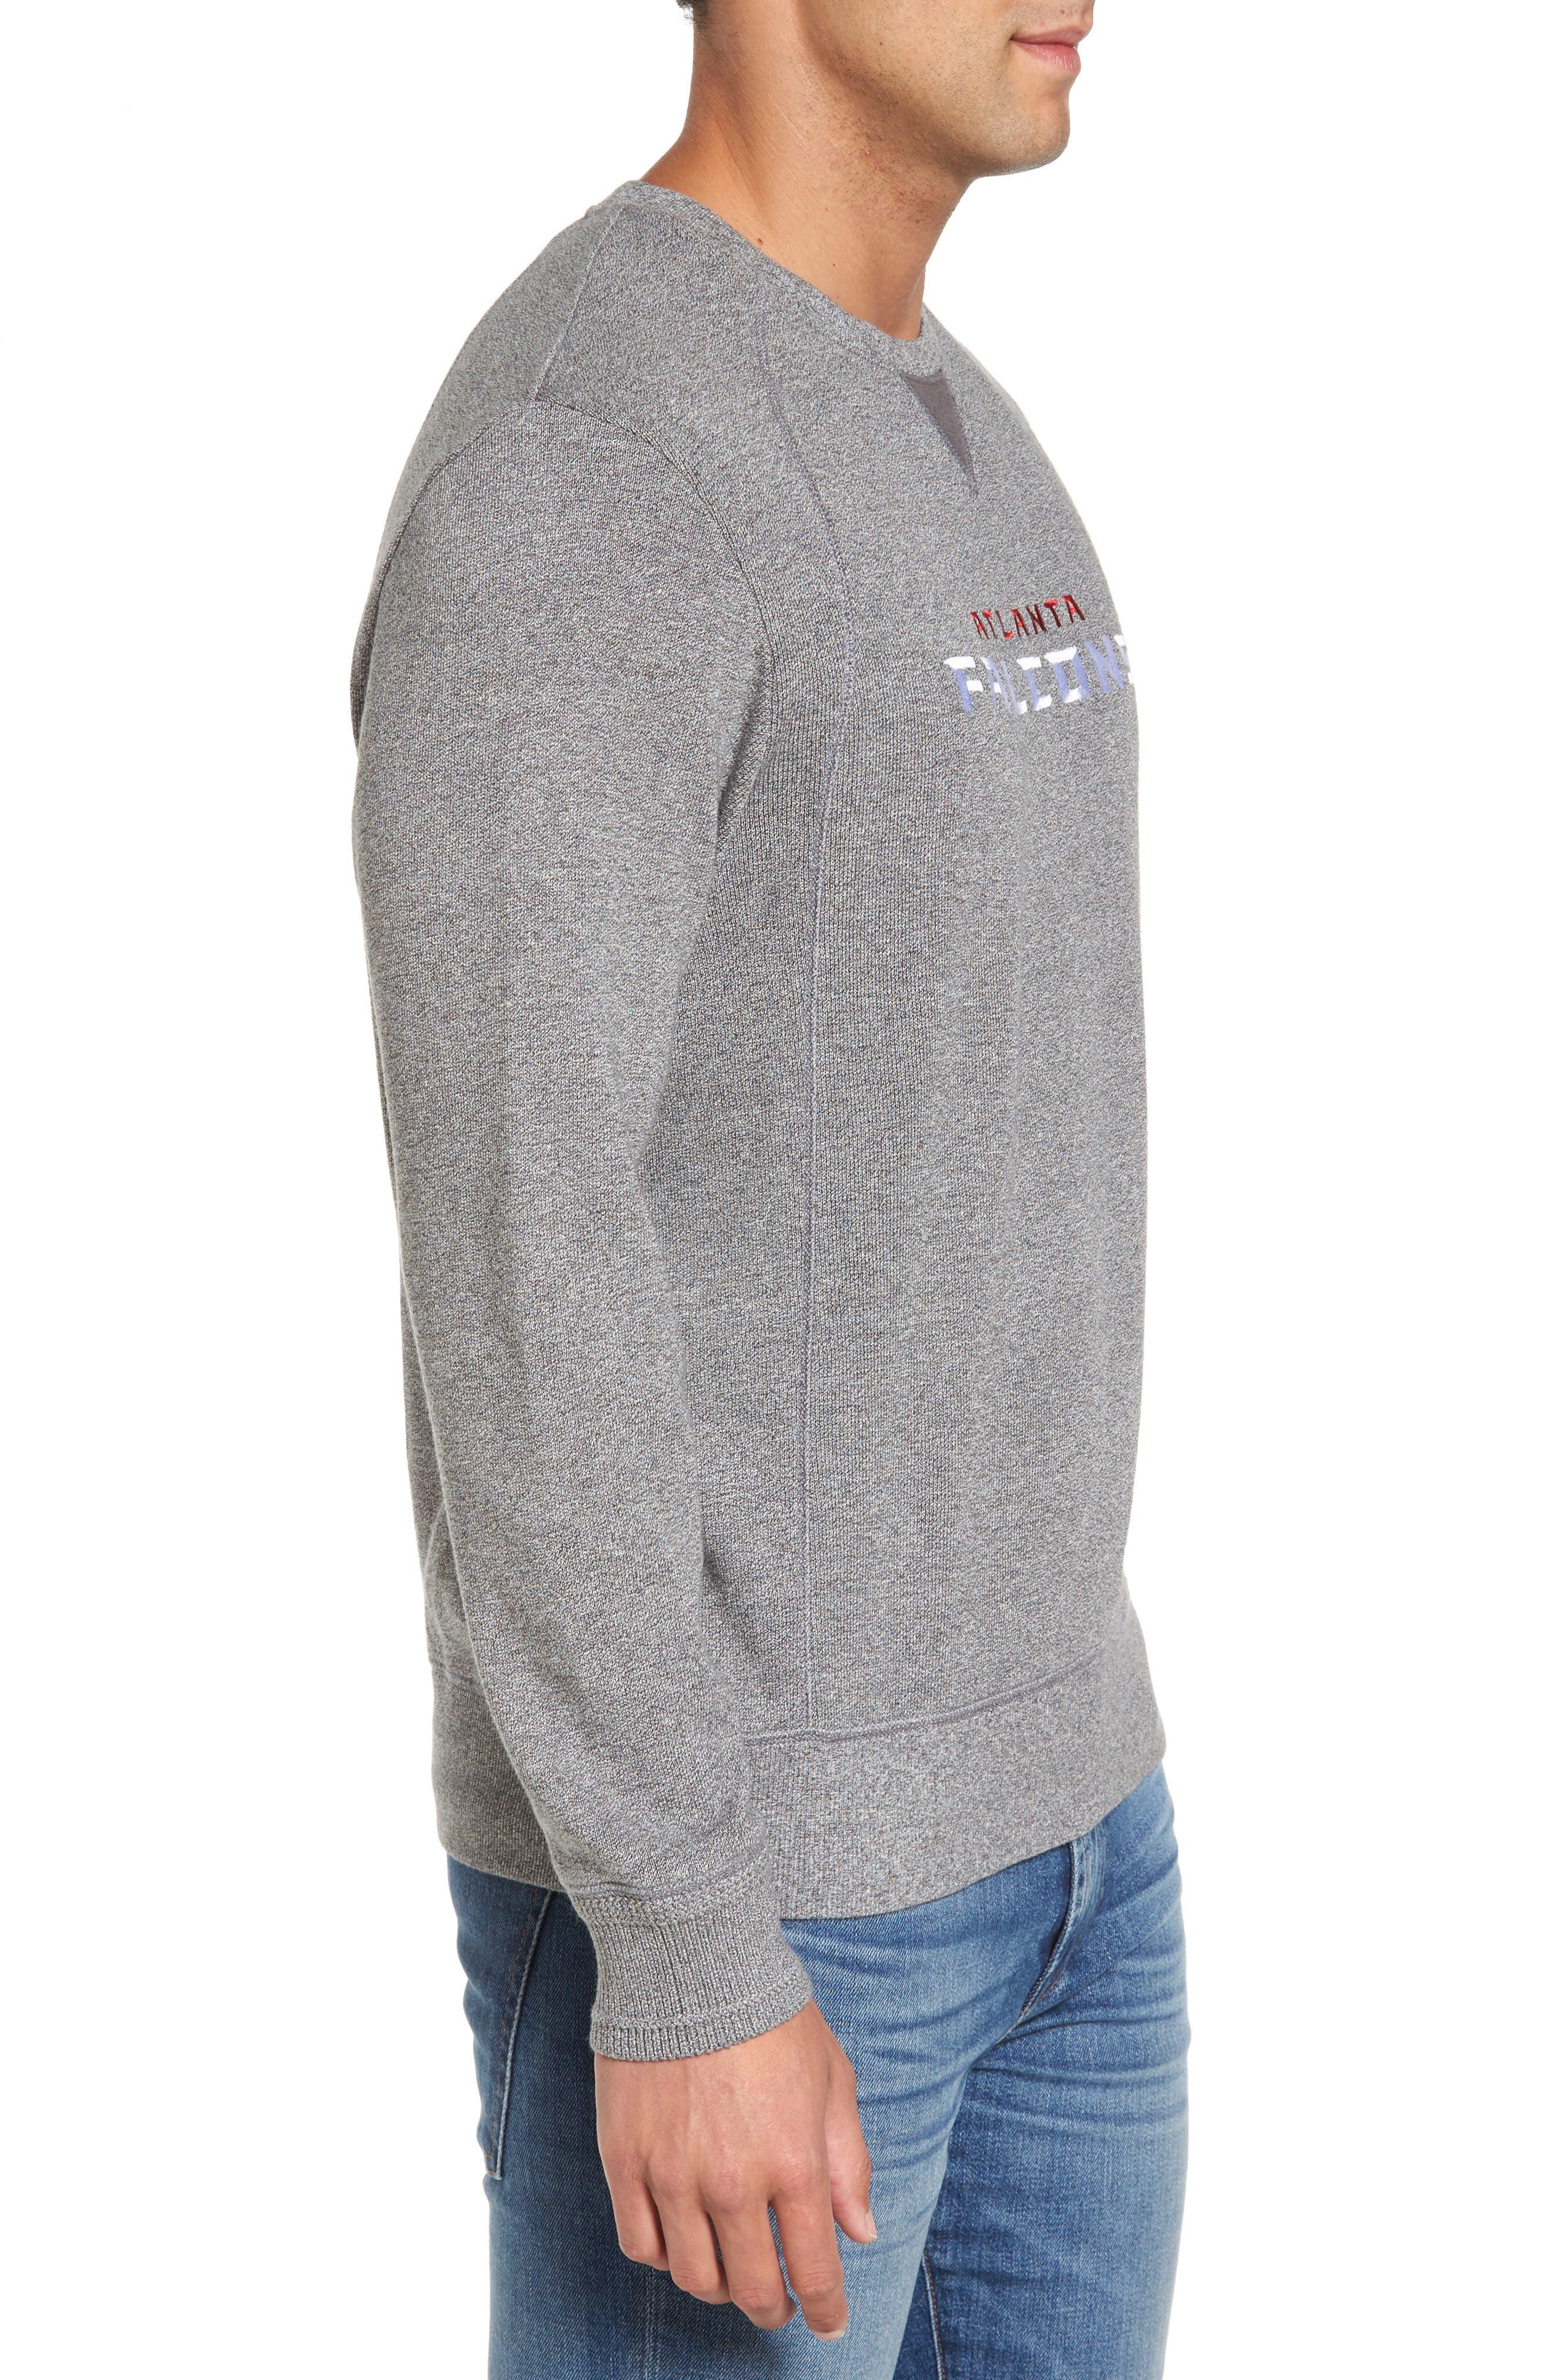 NFL Stitch of Liberty Embroidered Crewneck Sweatshirt,                             Alternate thumbnail 77, color,